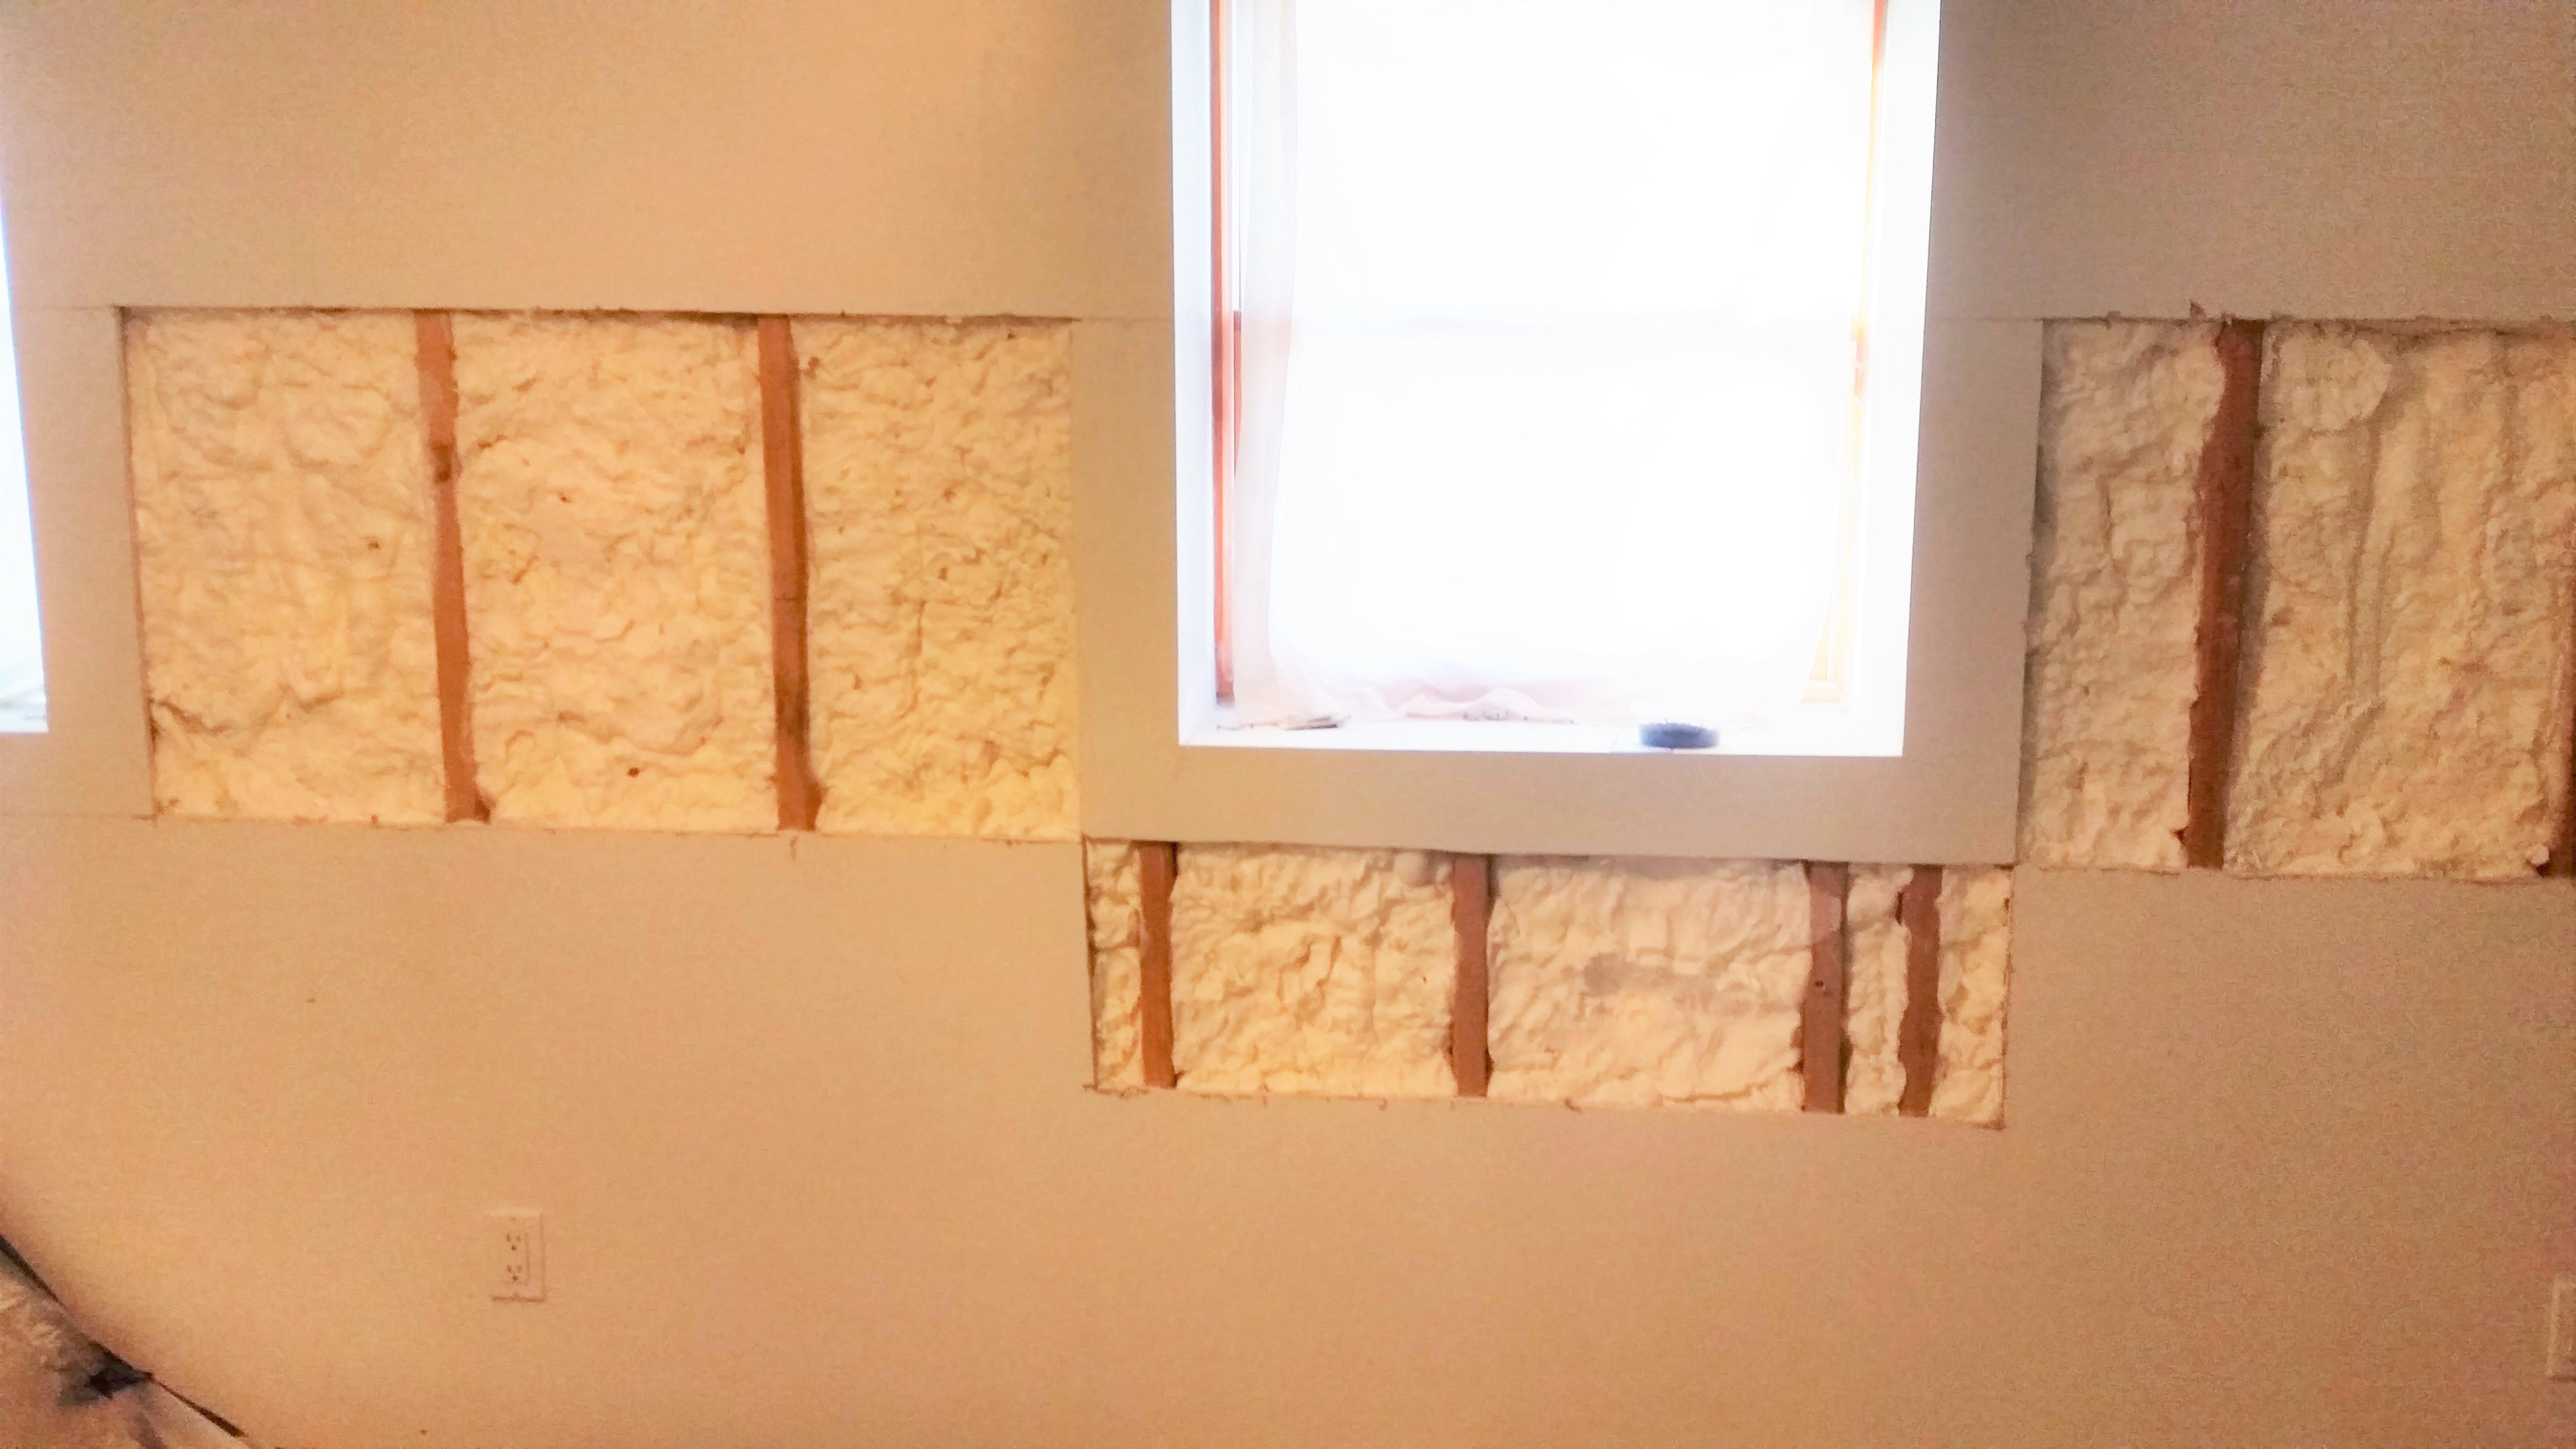 Retrofit basement exterior walls spray foam insulation staten retrofit basement exterior walls spray foam insulation nyc staten island brookly queens solutioingenieria Gallery